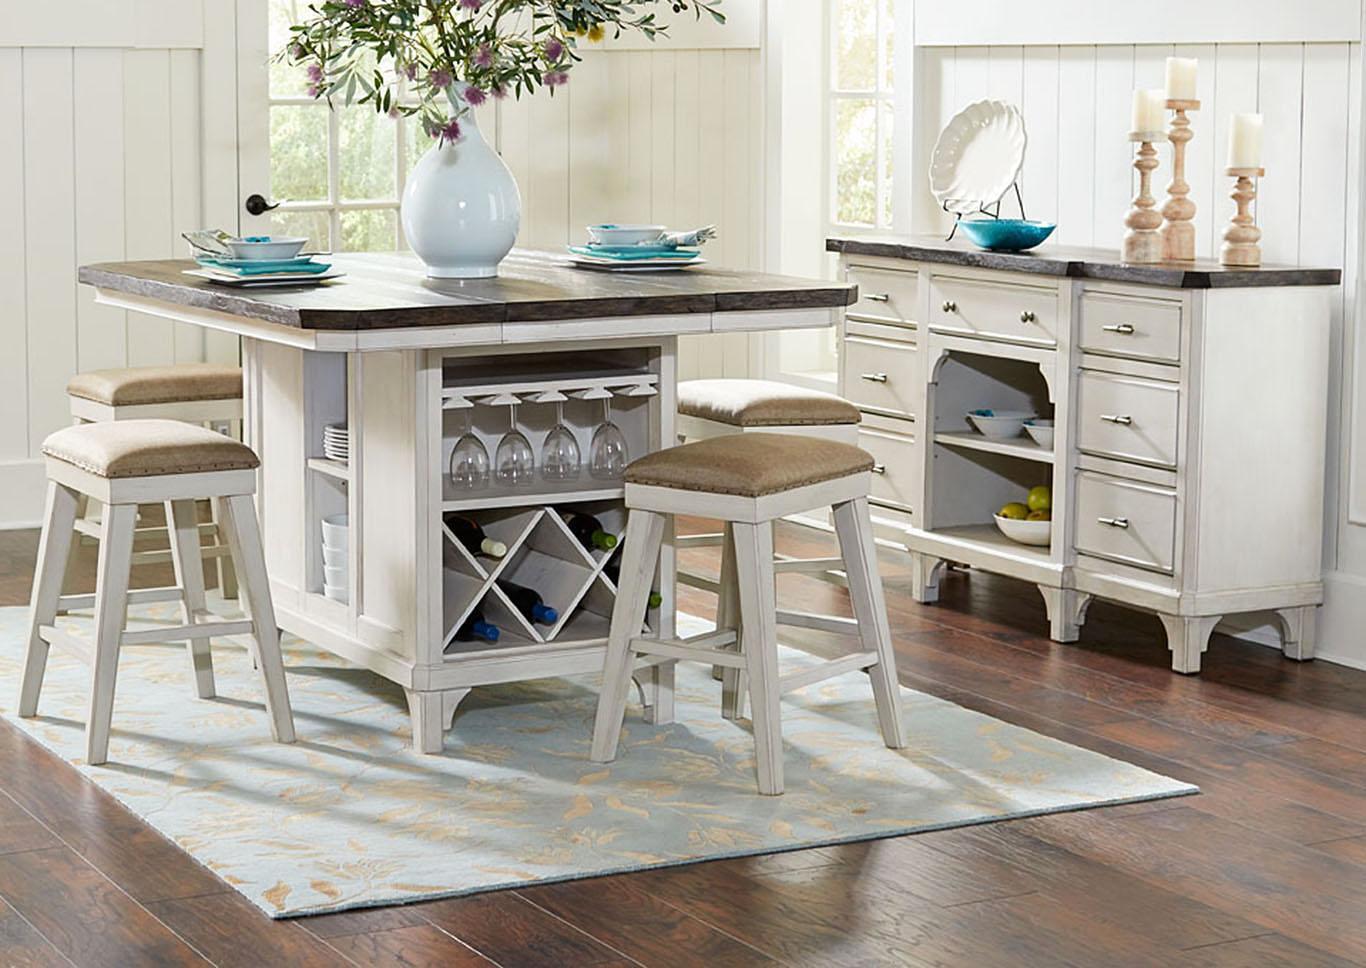 Huffman Koos Furniture Kitchen Island table